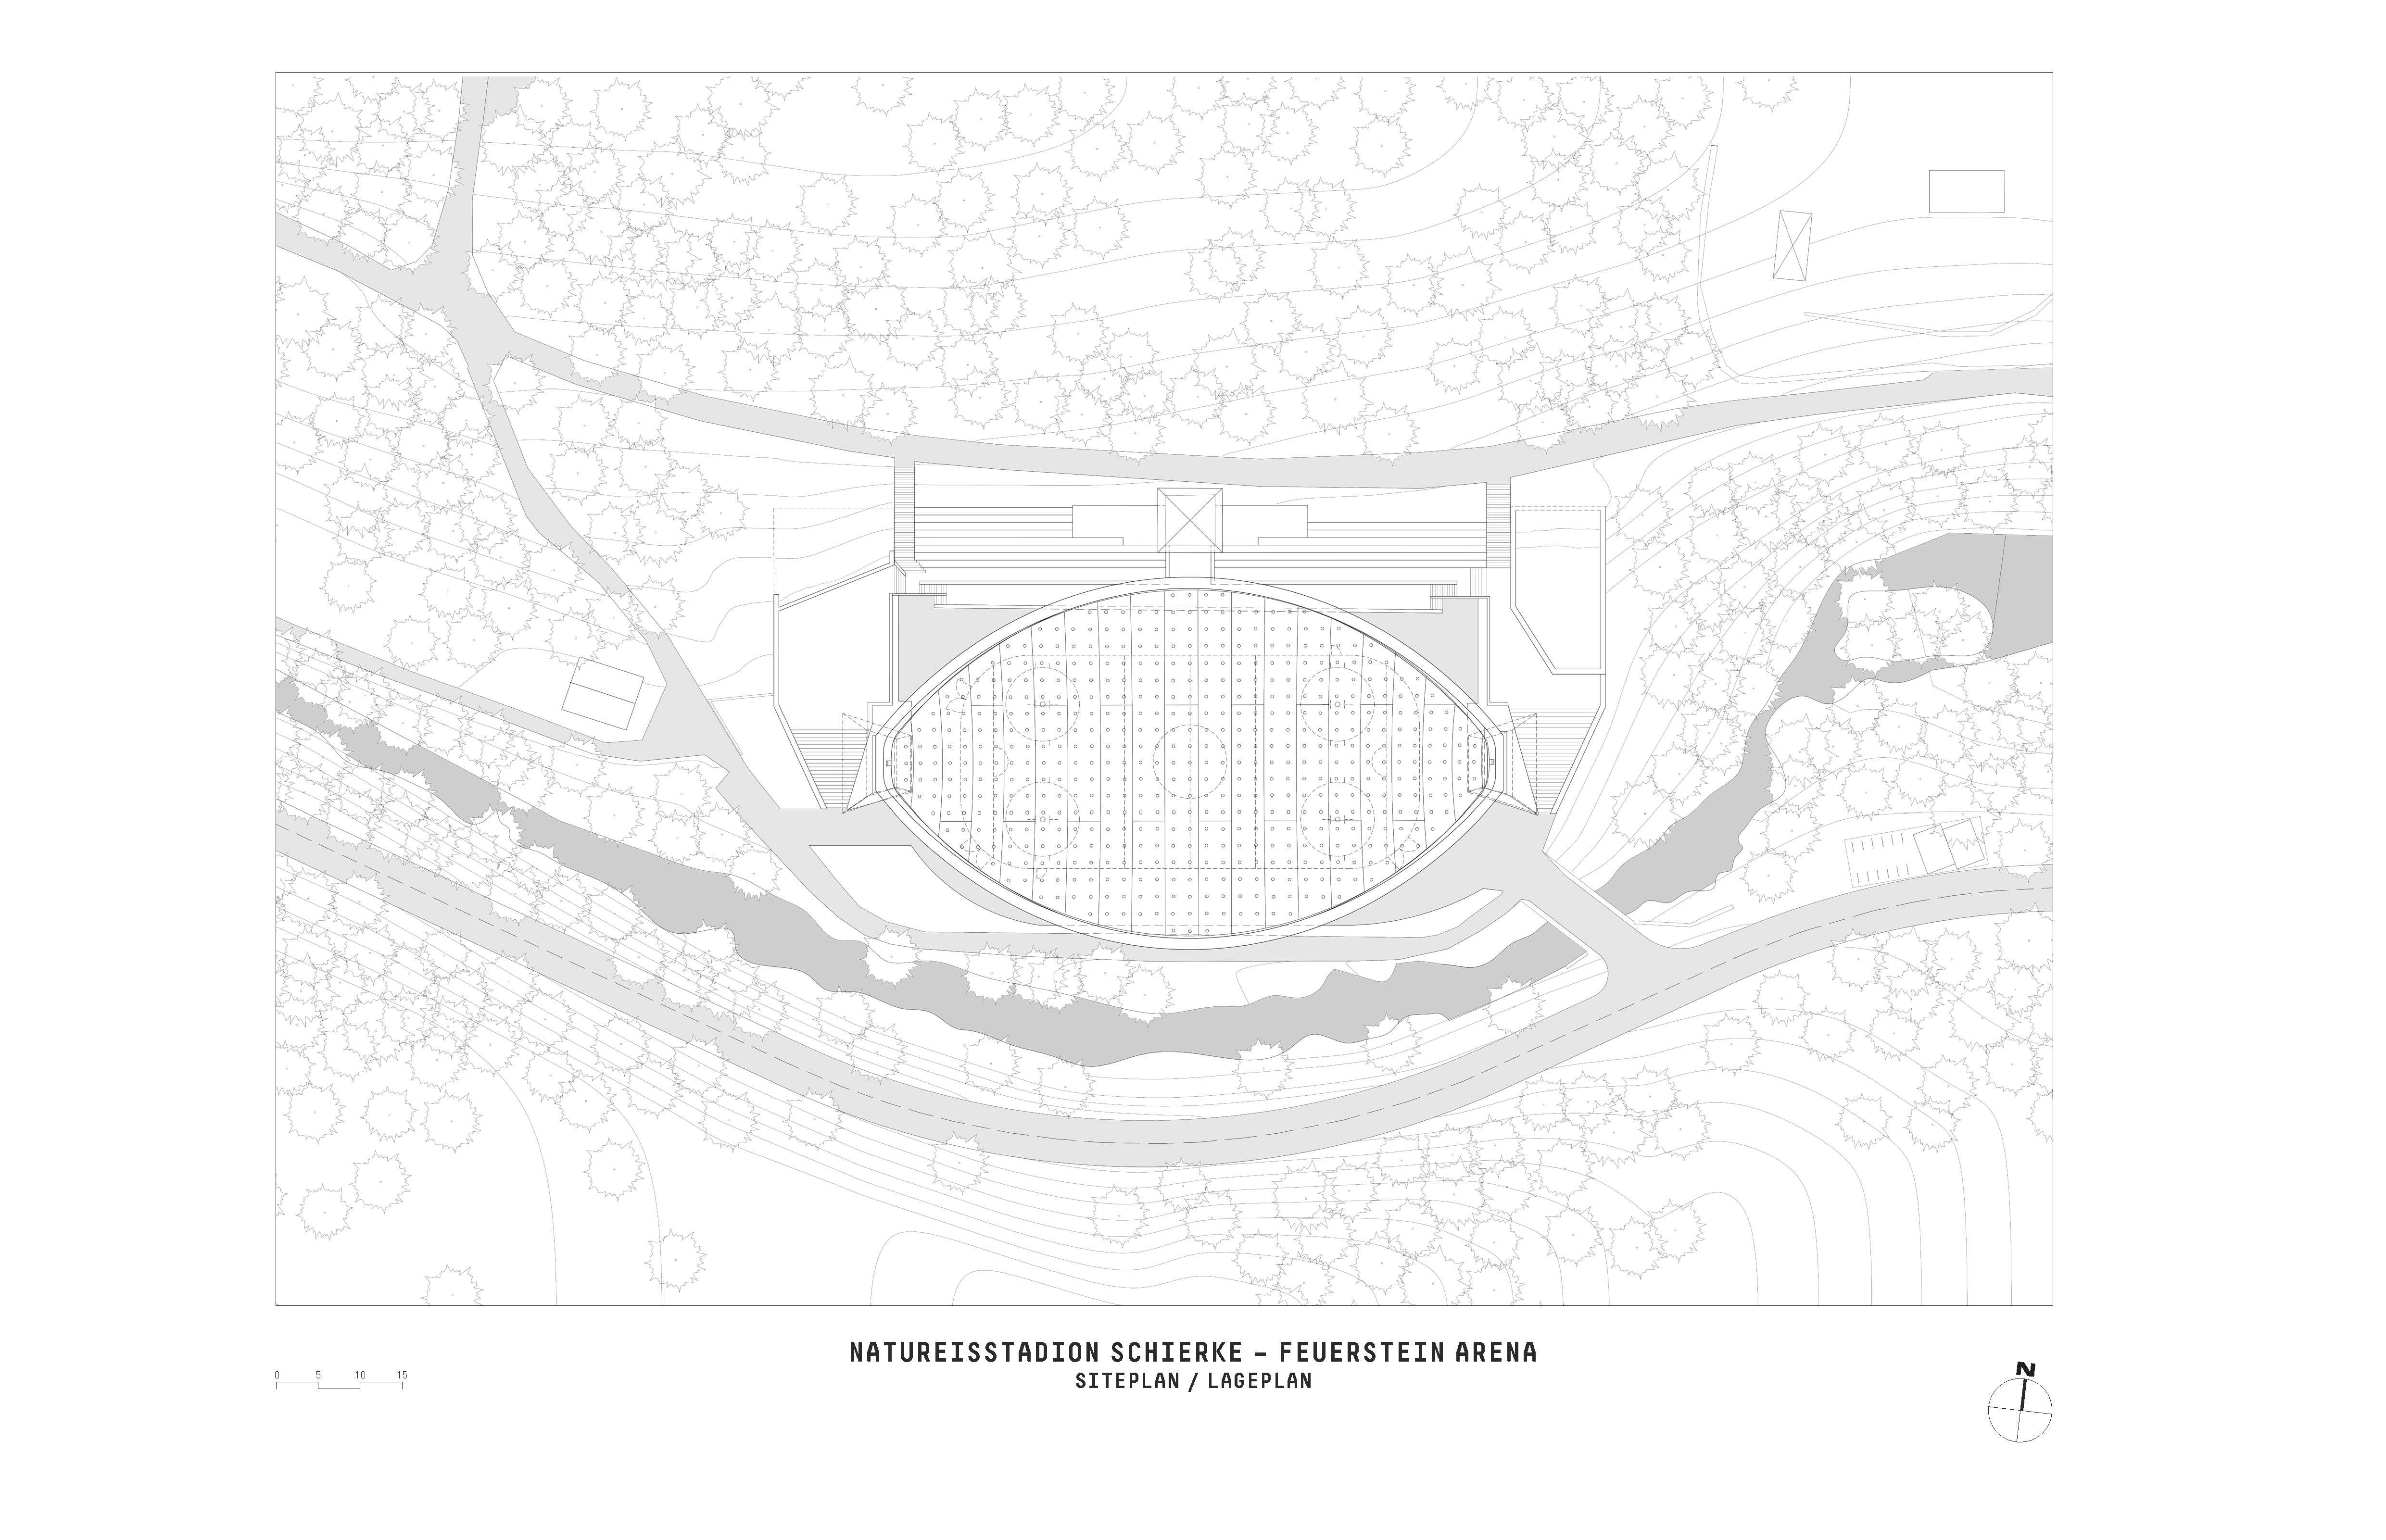 Ice Stadium Schierke site plan